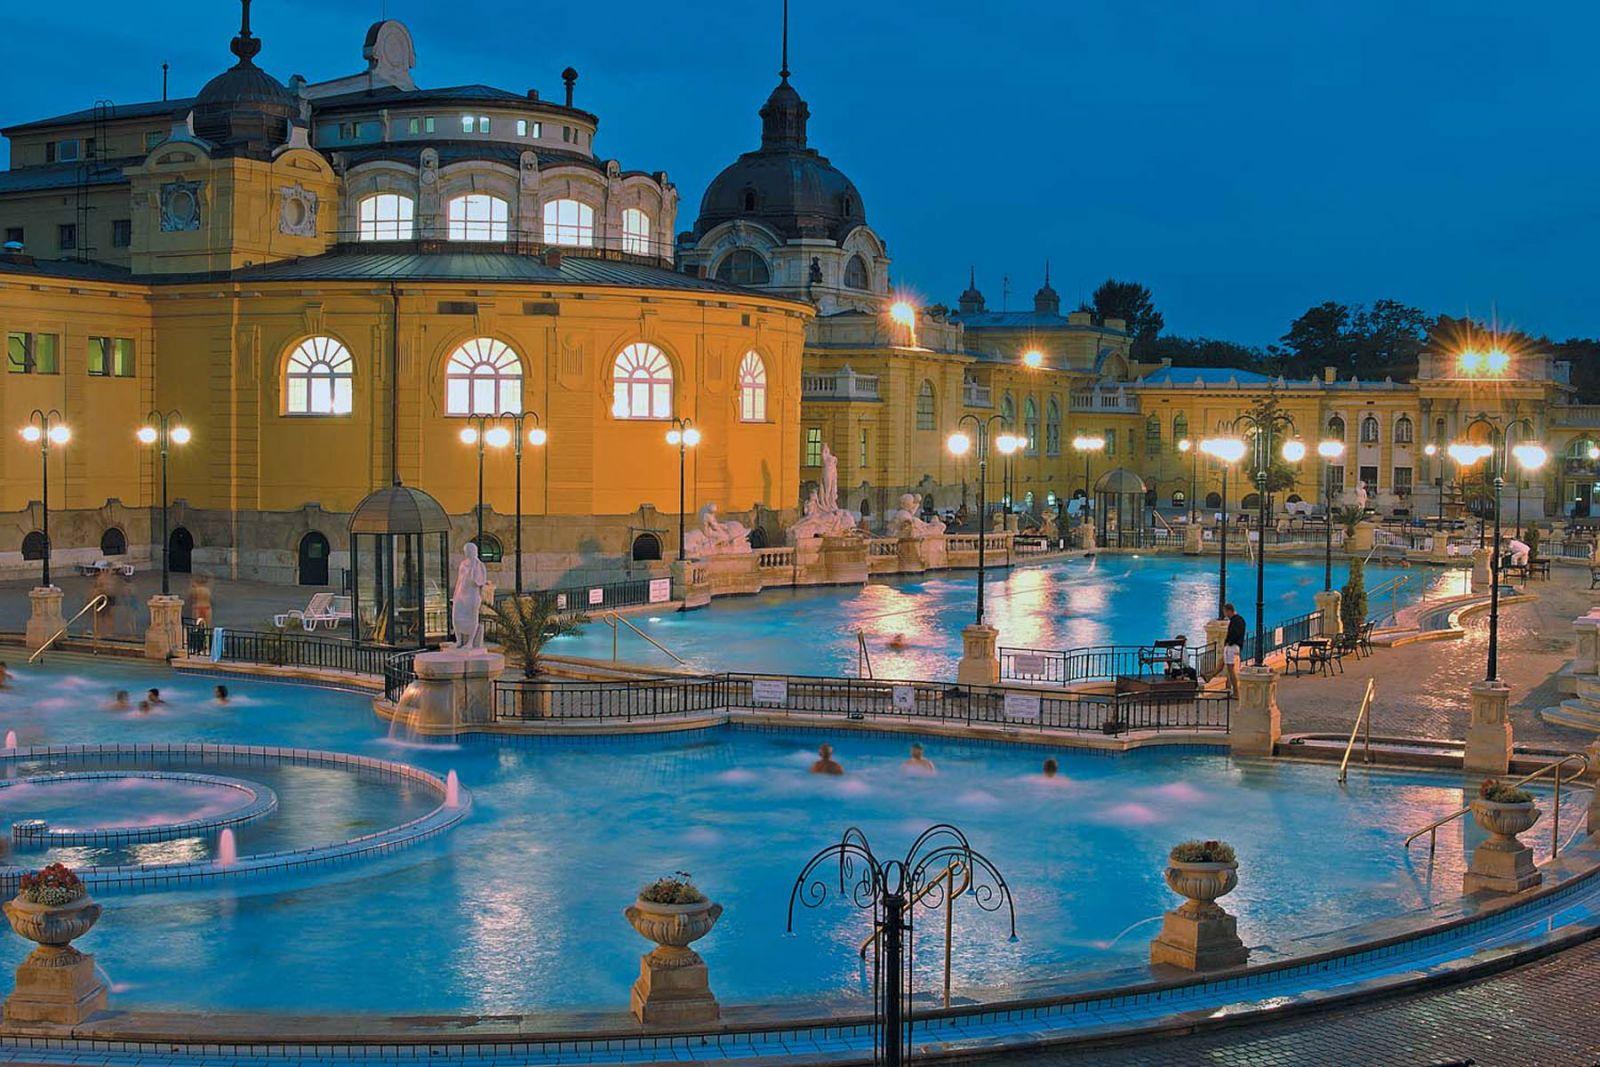 Szecheny thermal bath Budapest